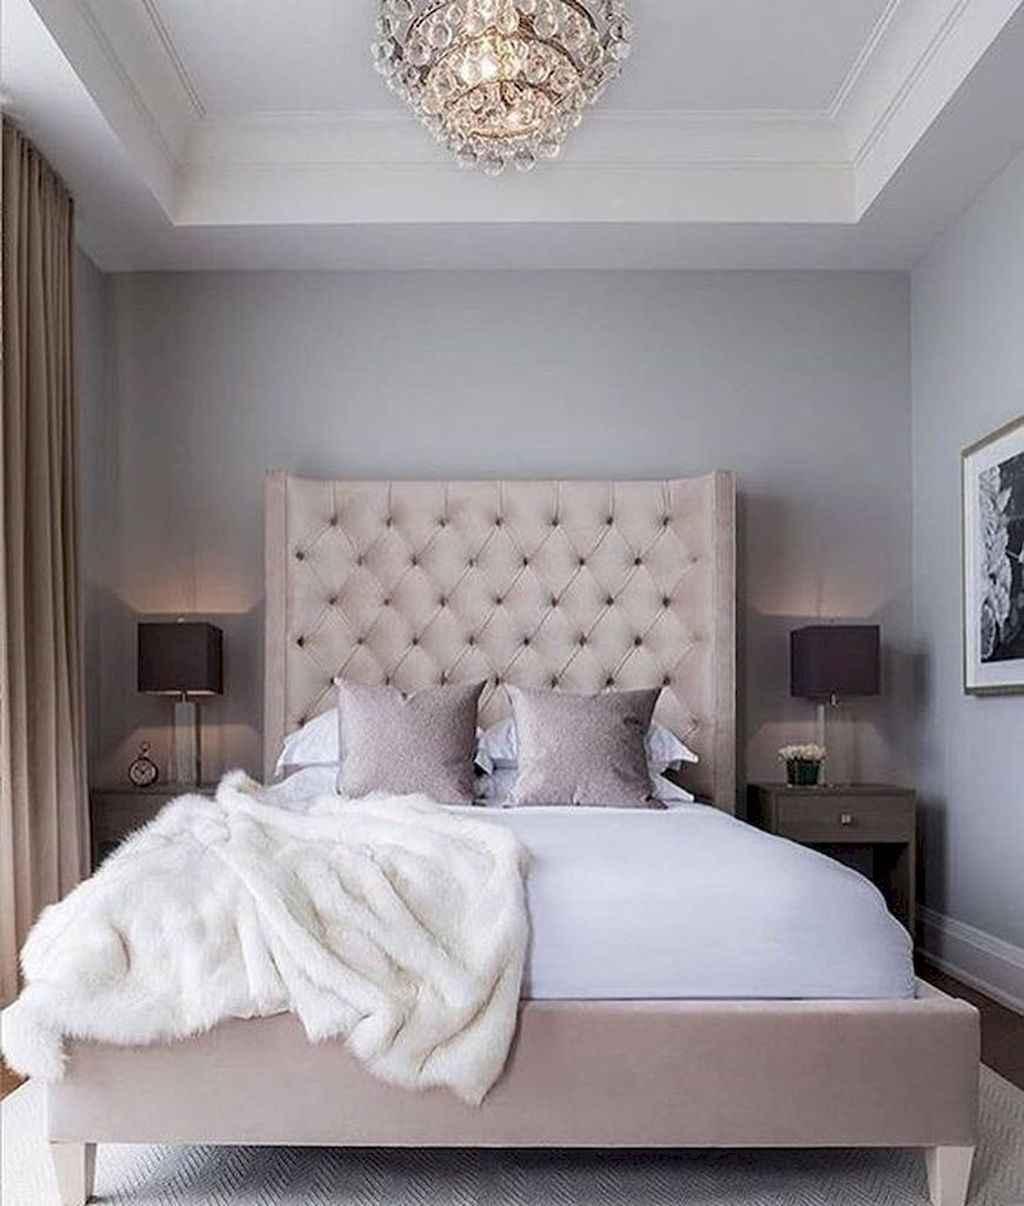 Incredible master bedroom ideas (55)